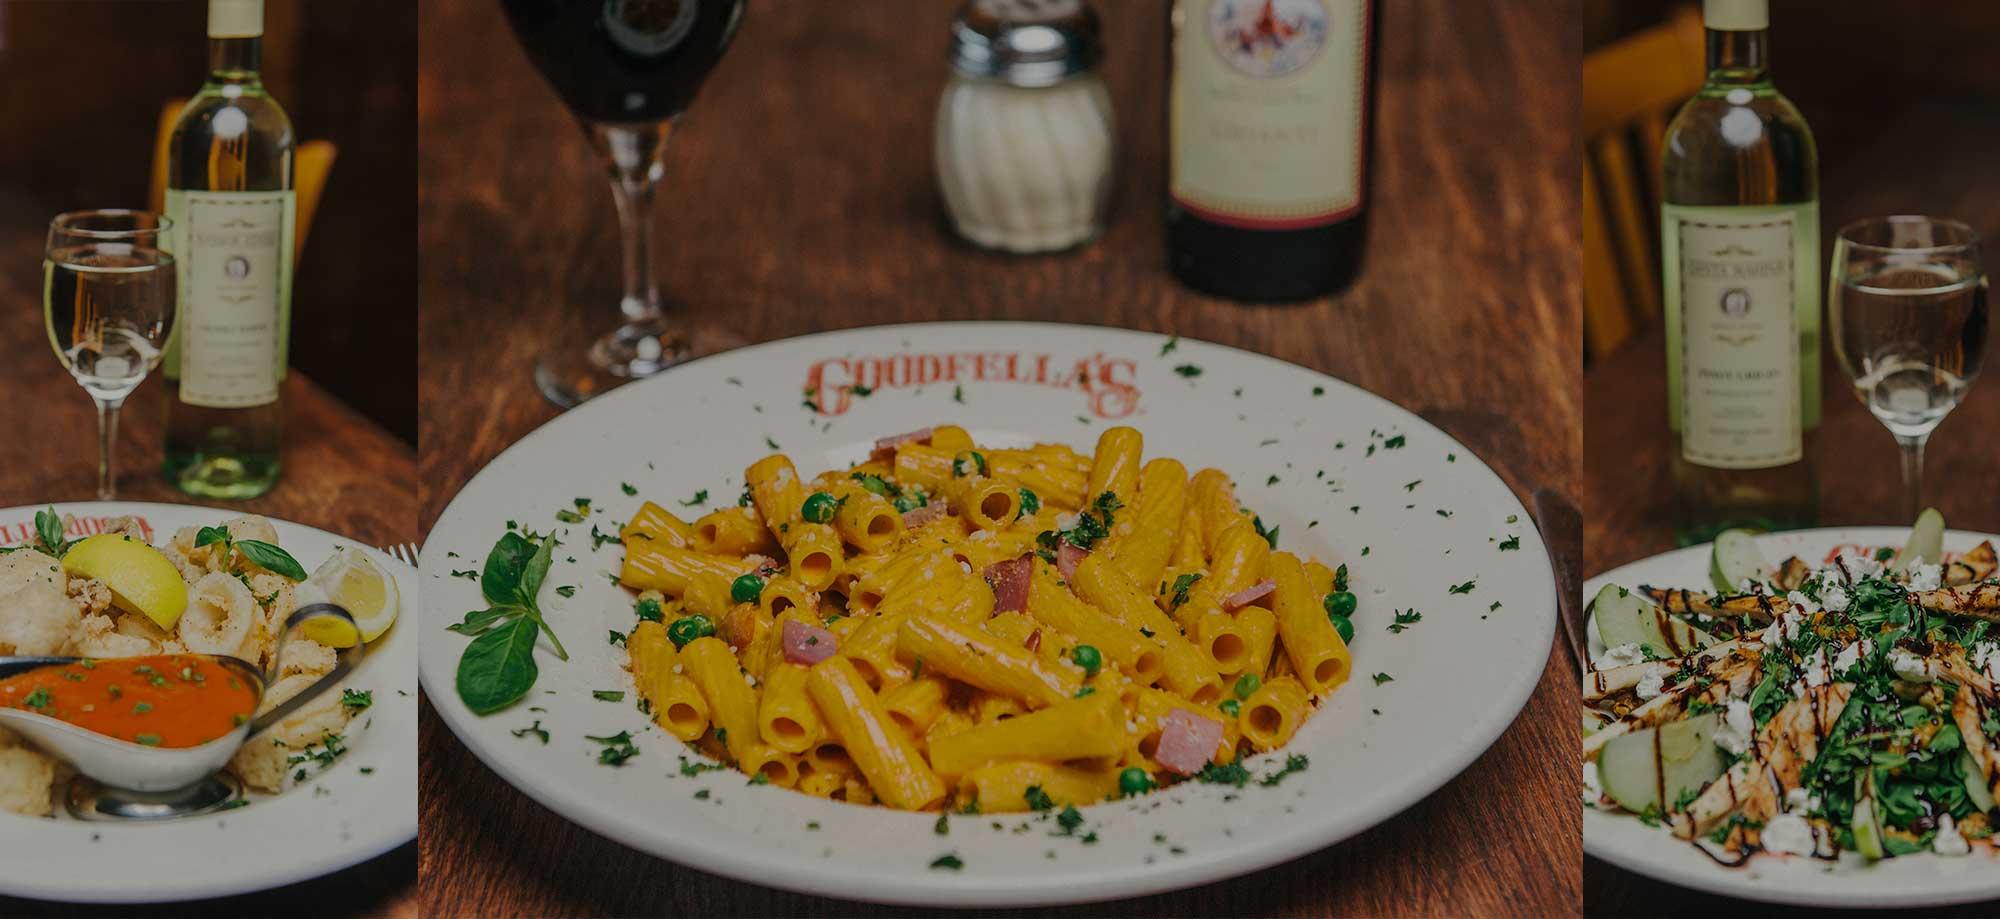 Goodfella's Catering Staten Island